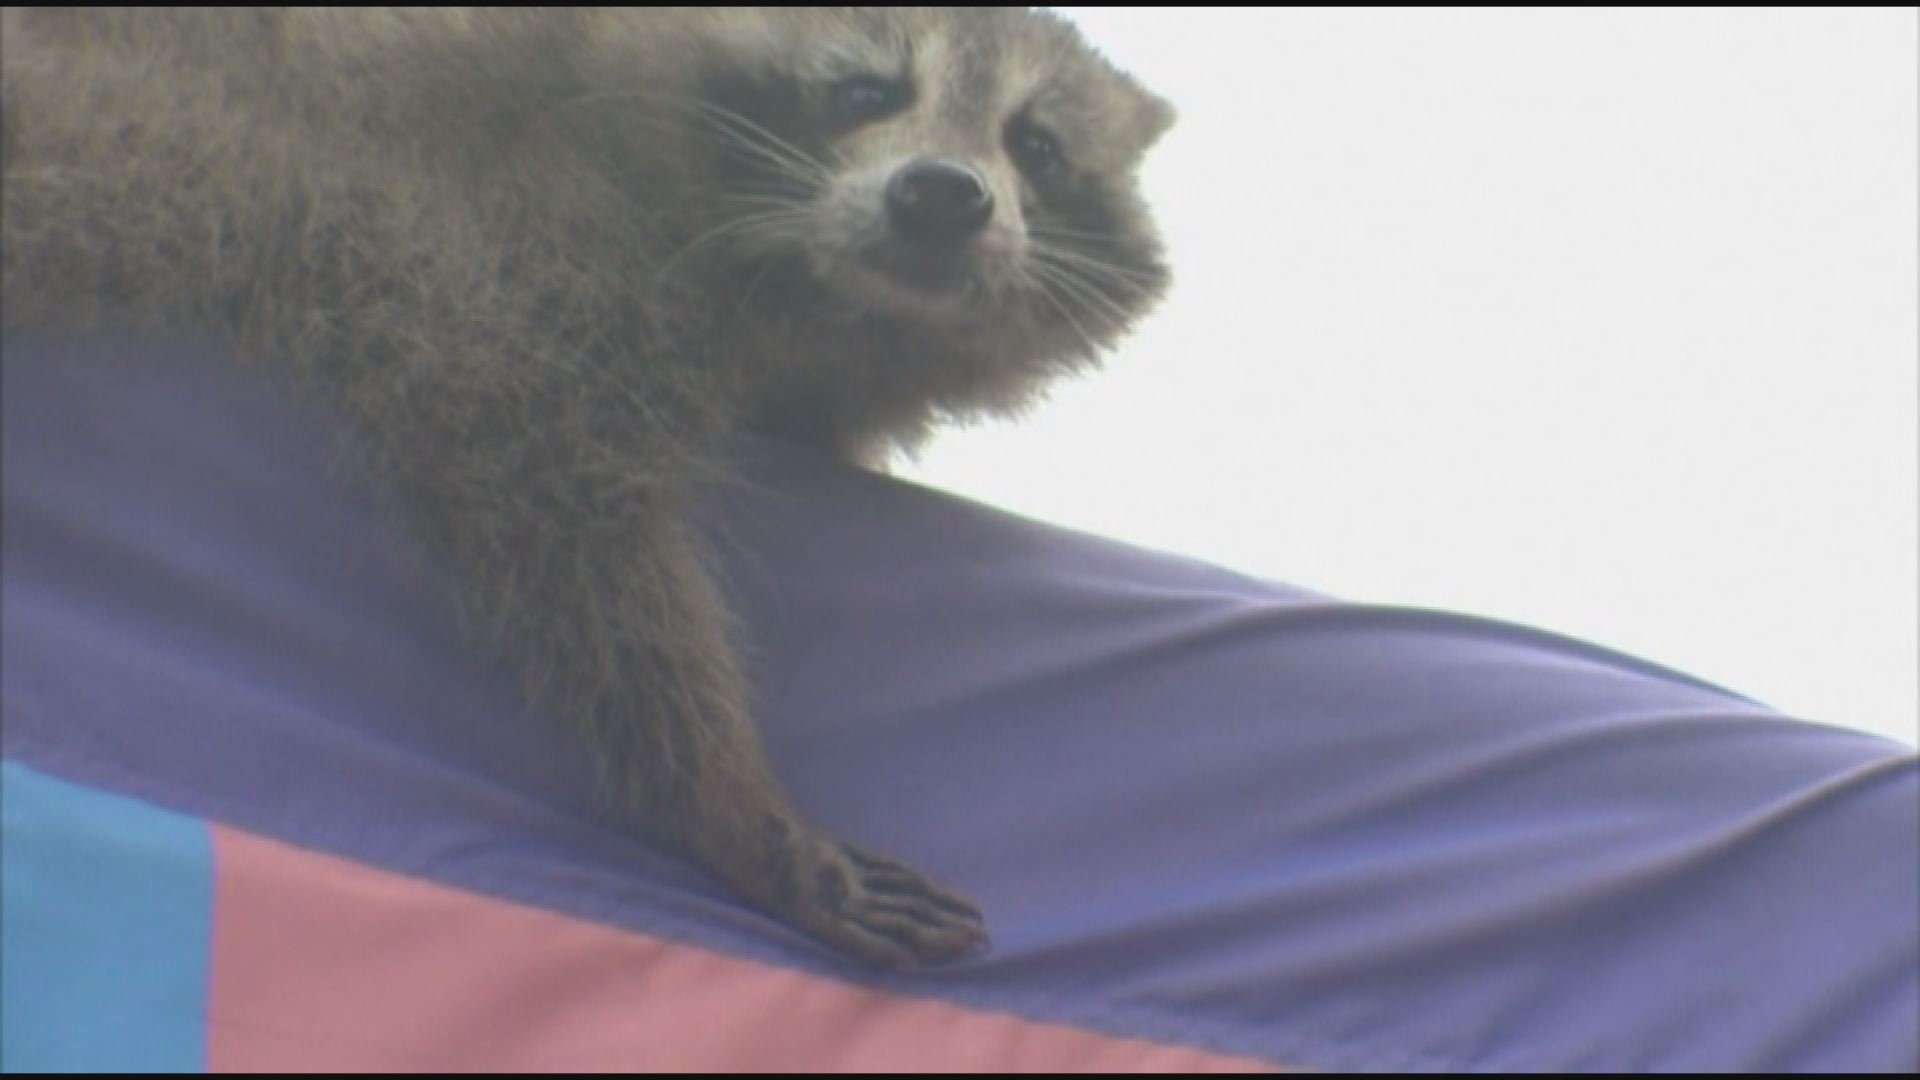 """I immediately regret this decision."" - Philadelphia raccoon"